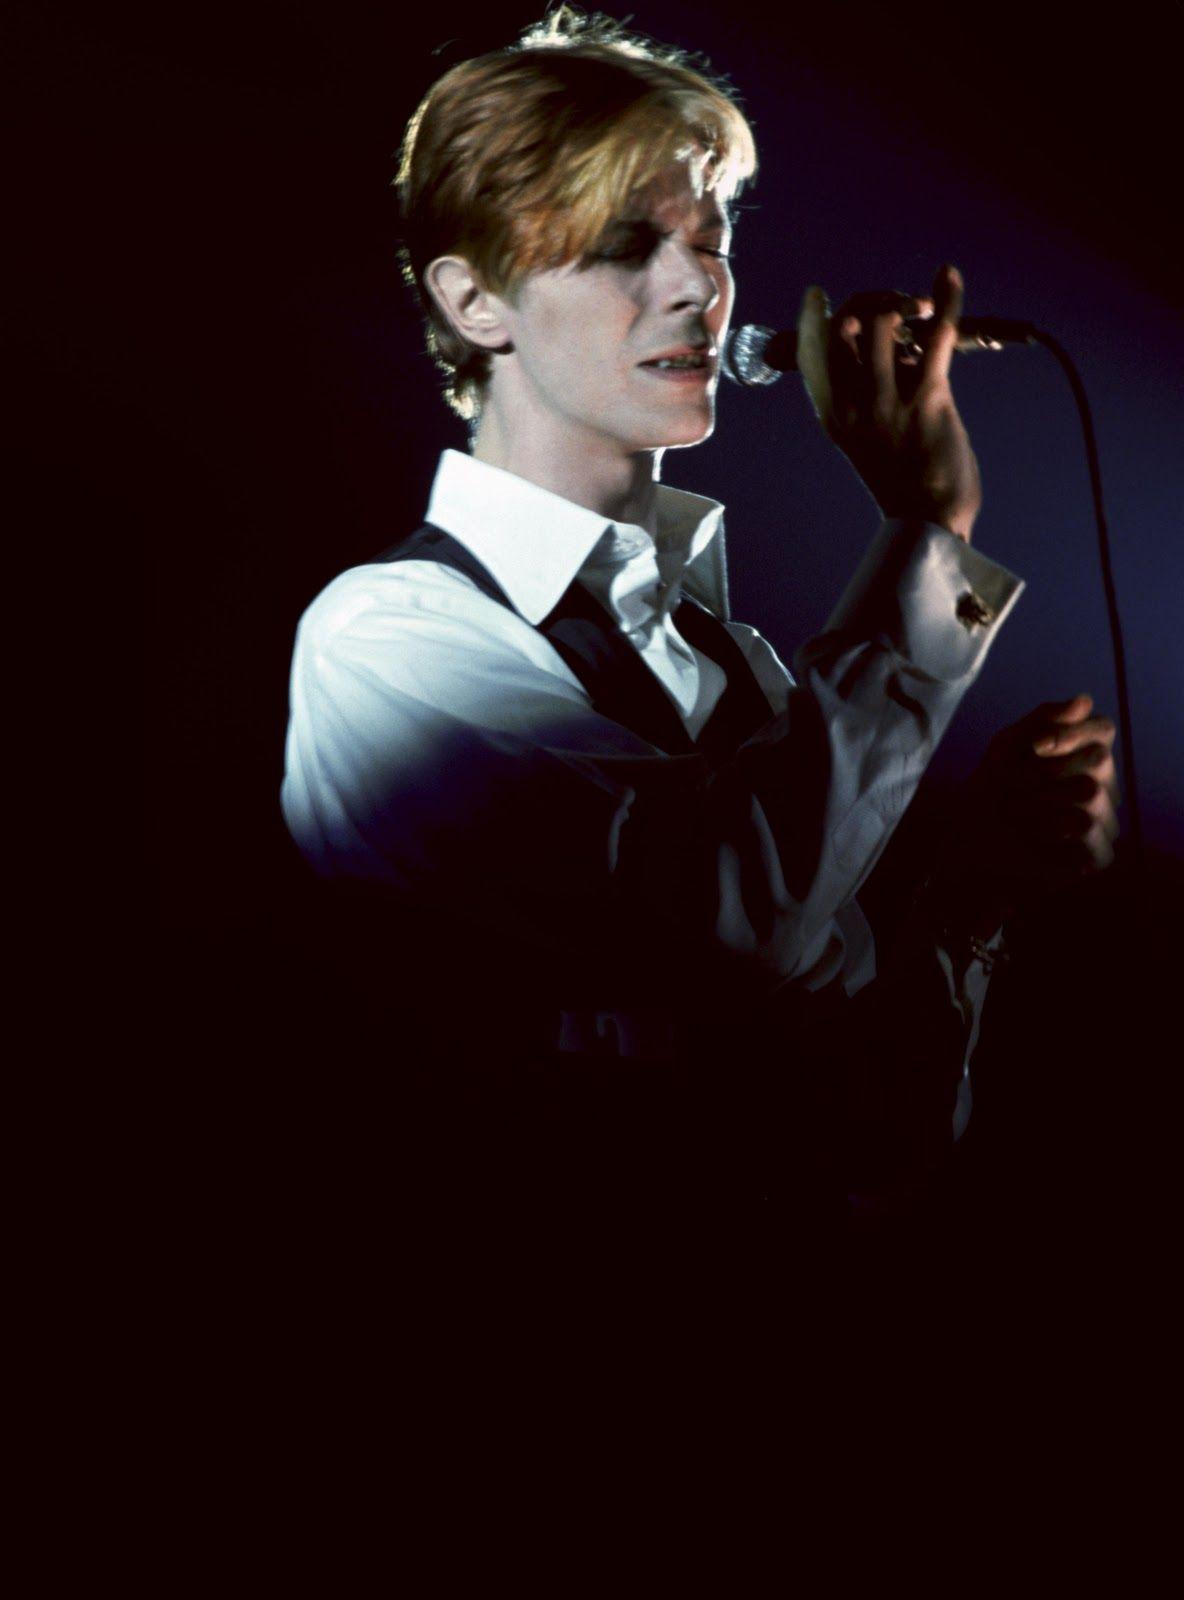 David bowie black tie white noise.